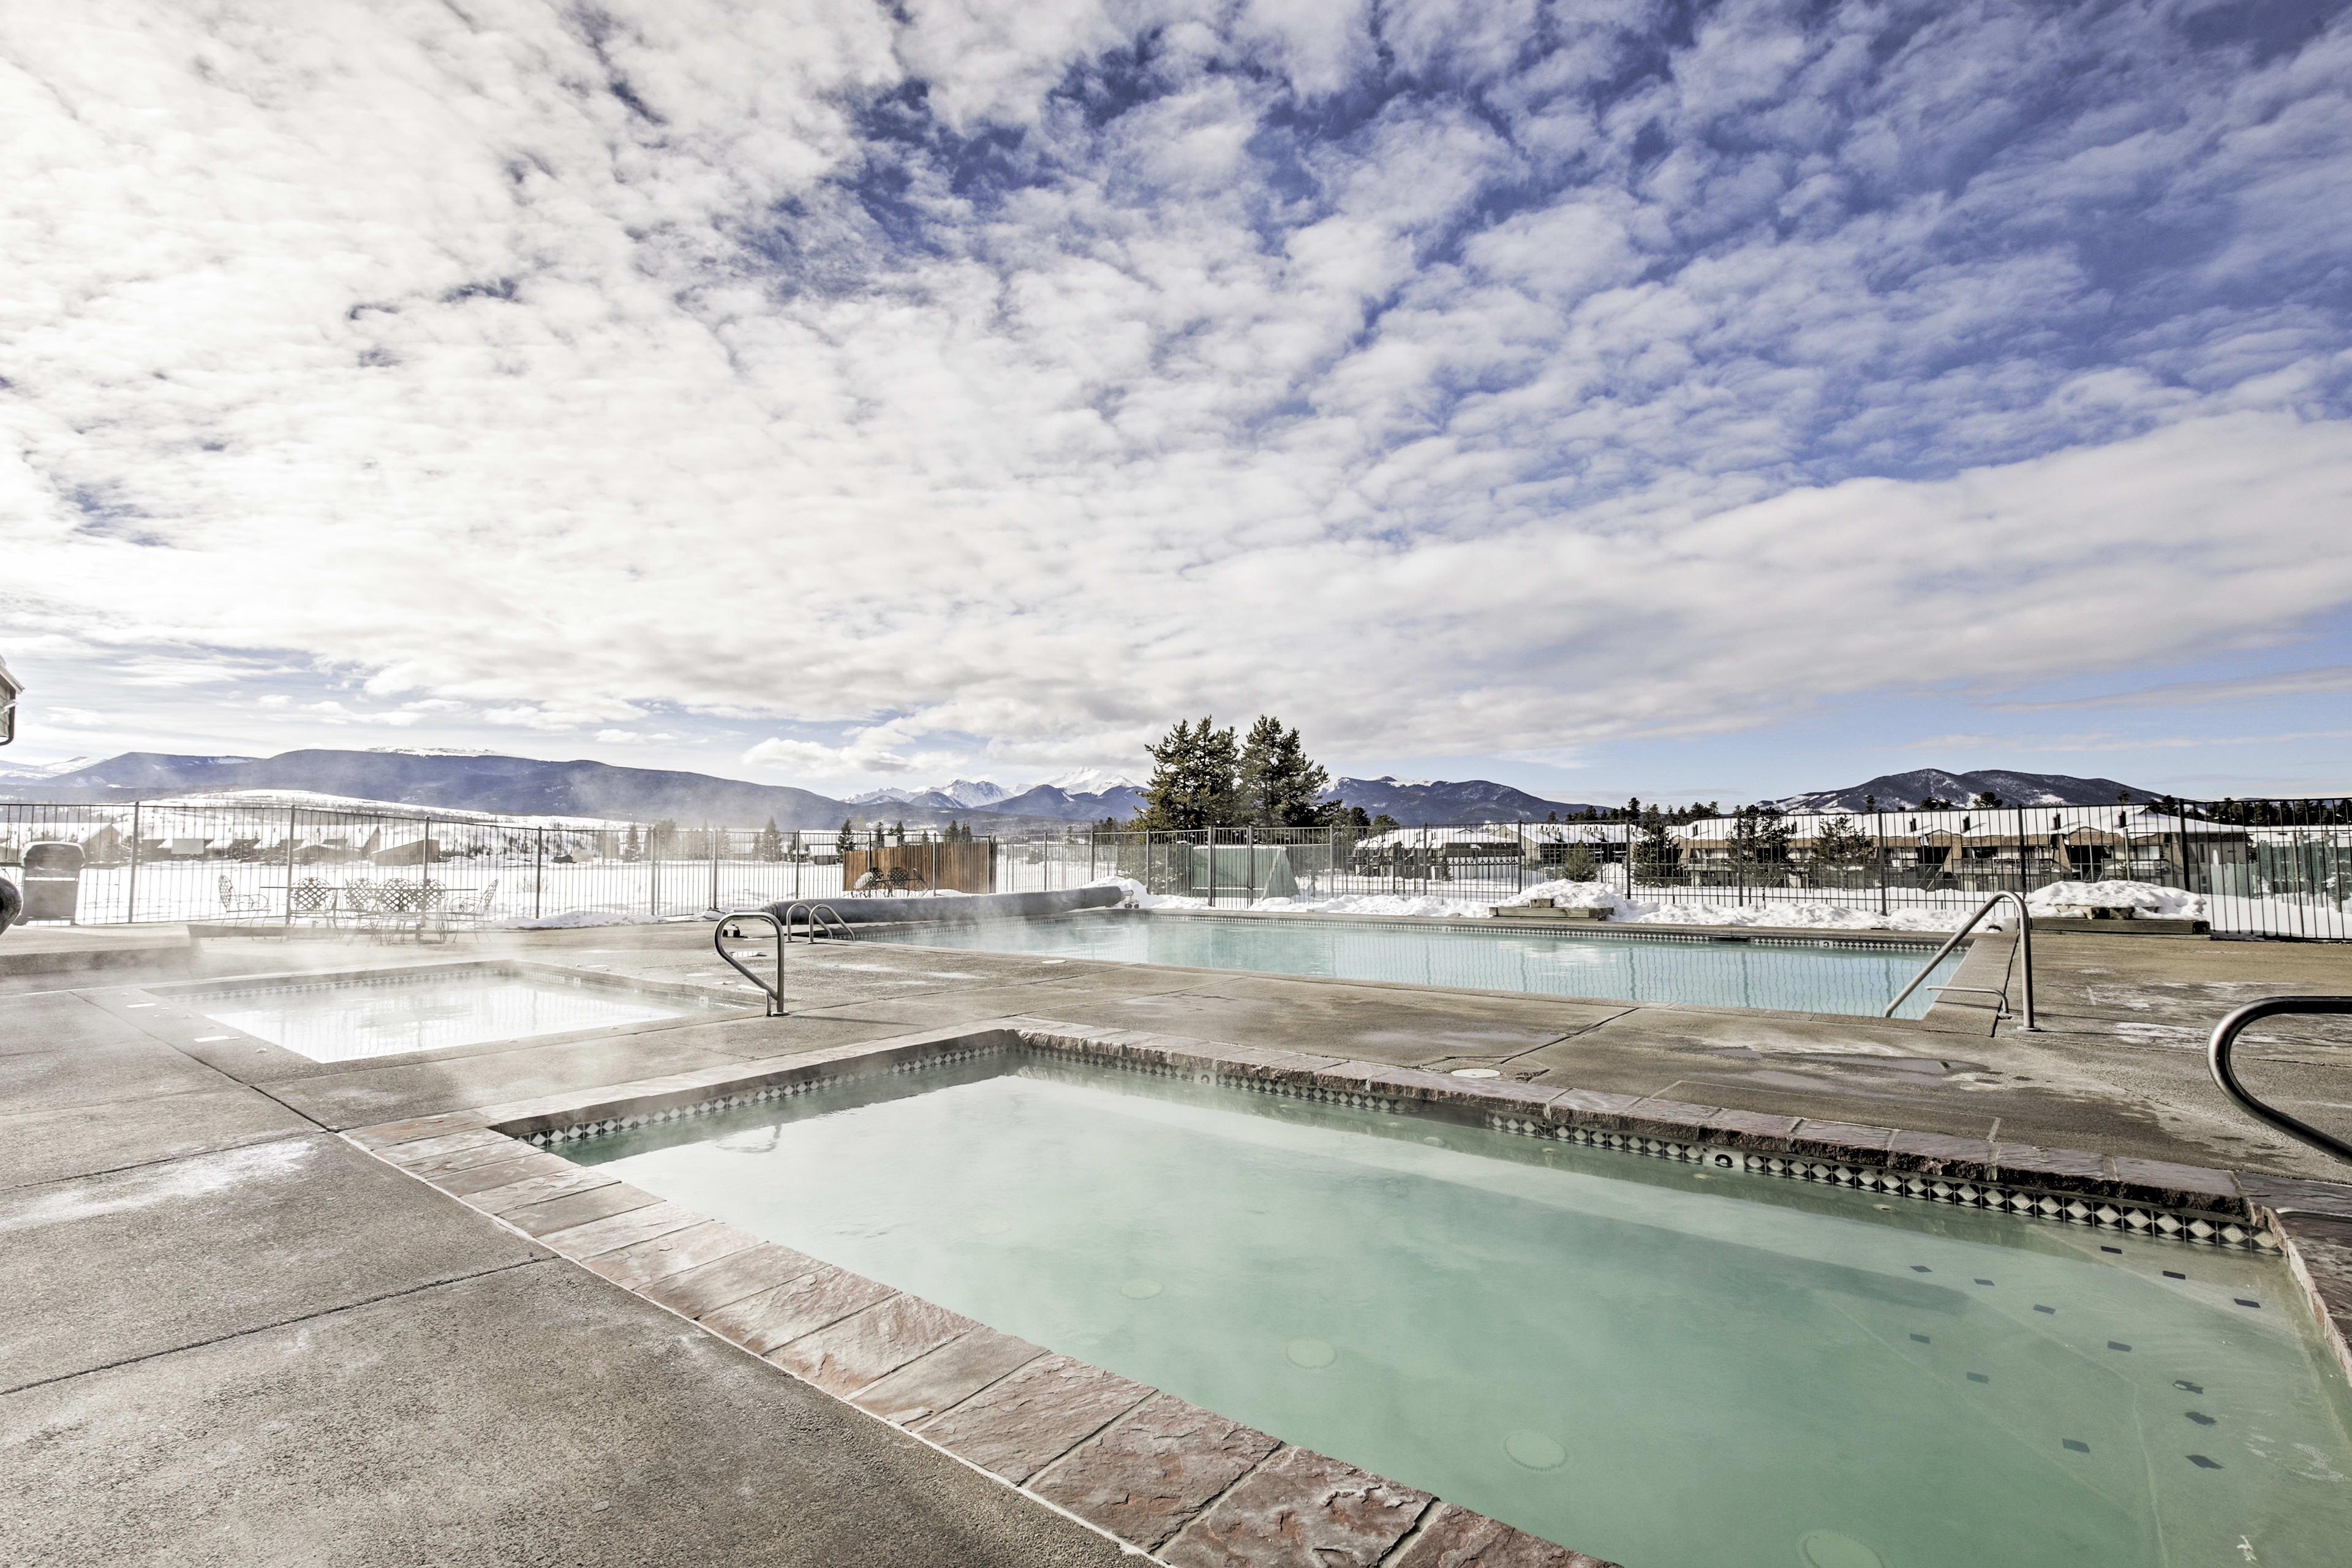 Community Amenities | Outdoor Swimming Pool | Hot Tub